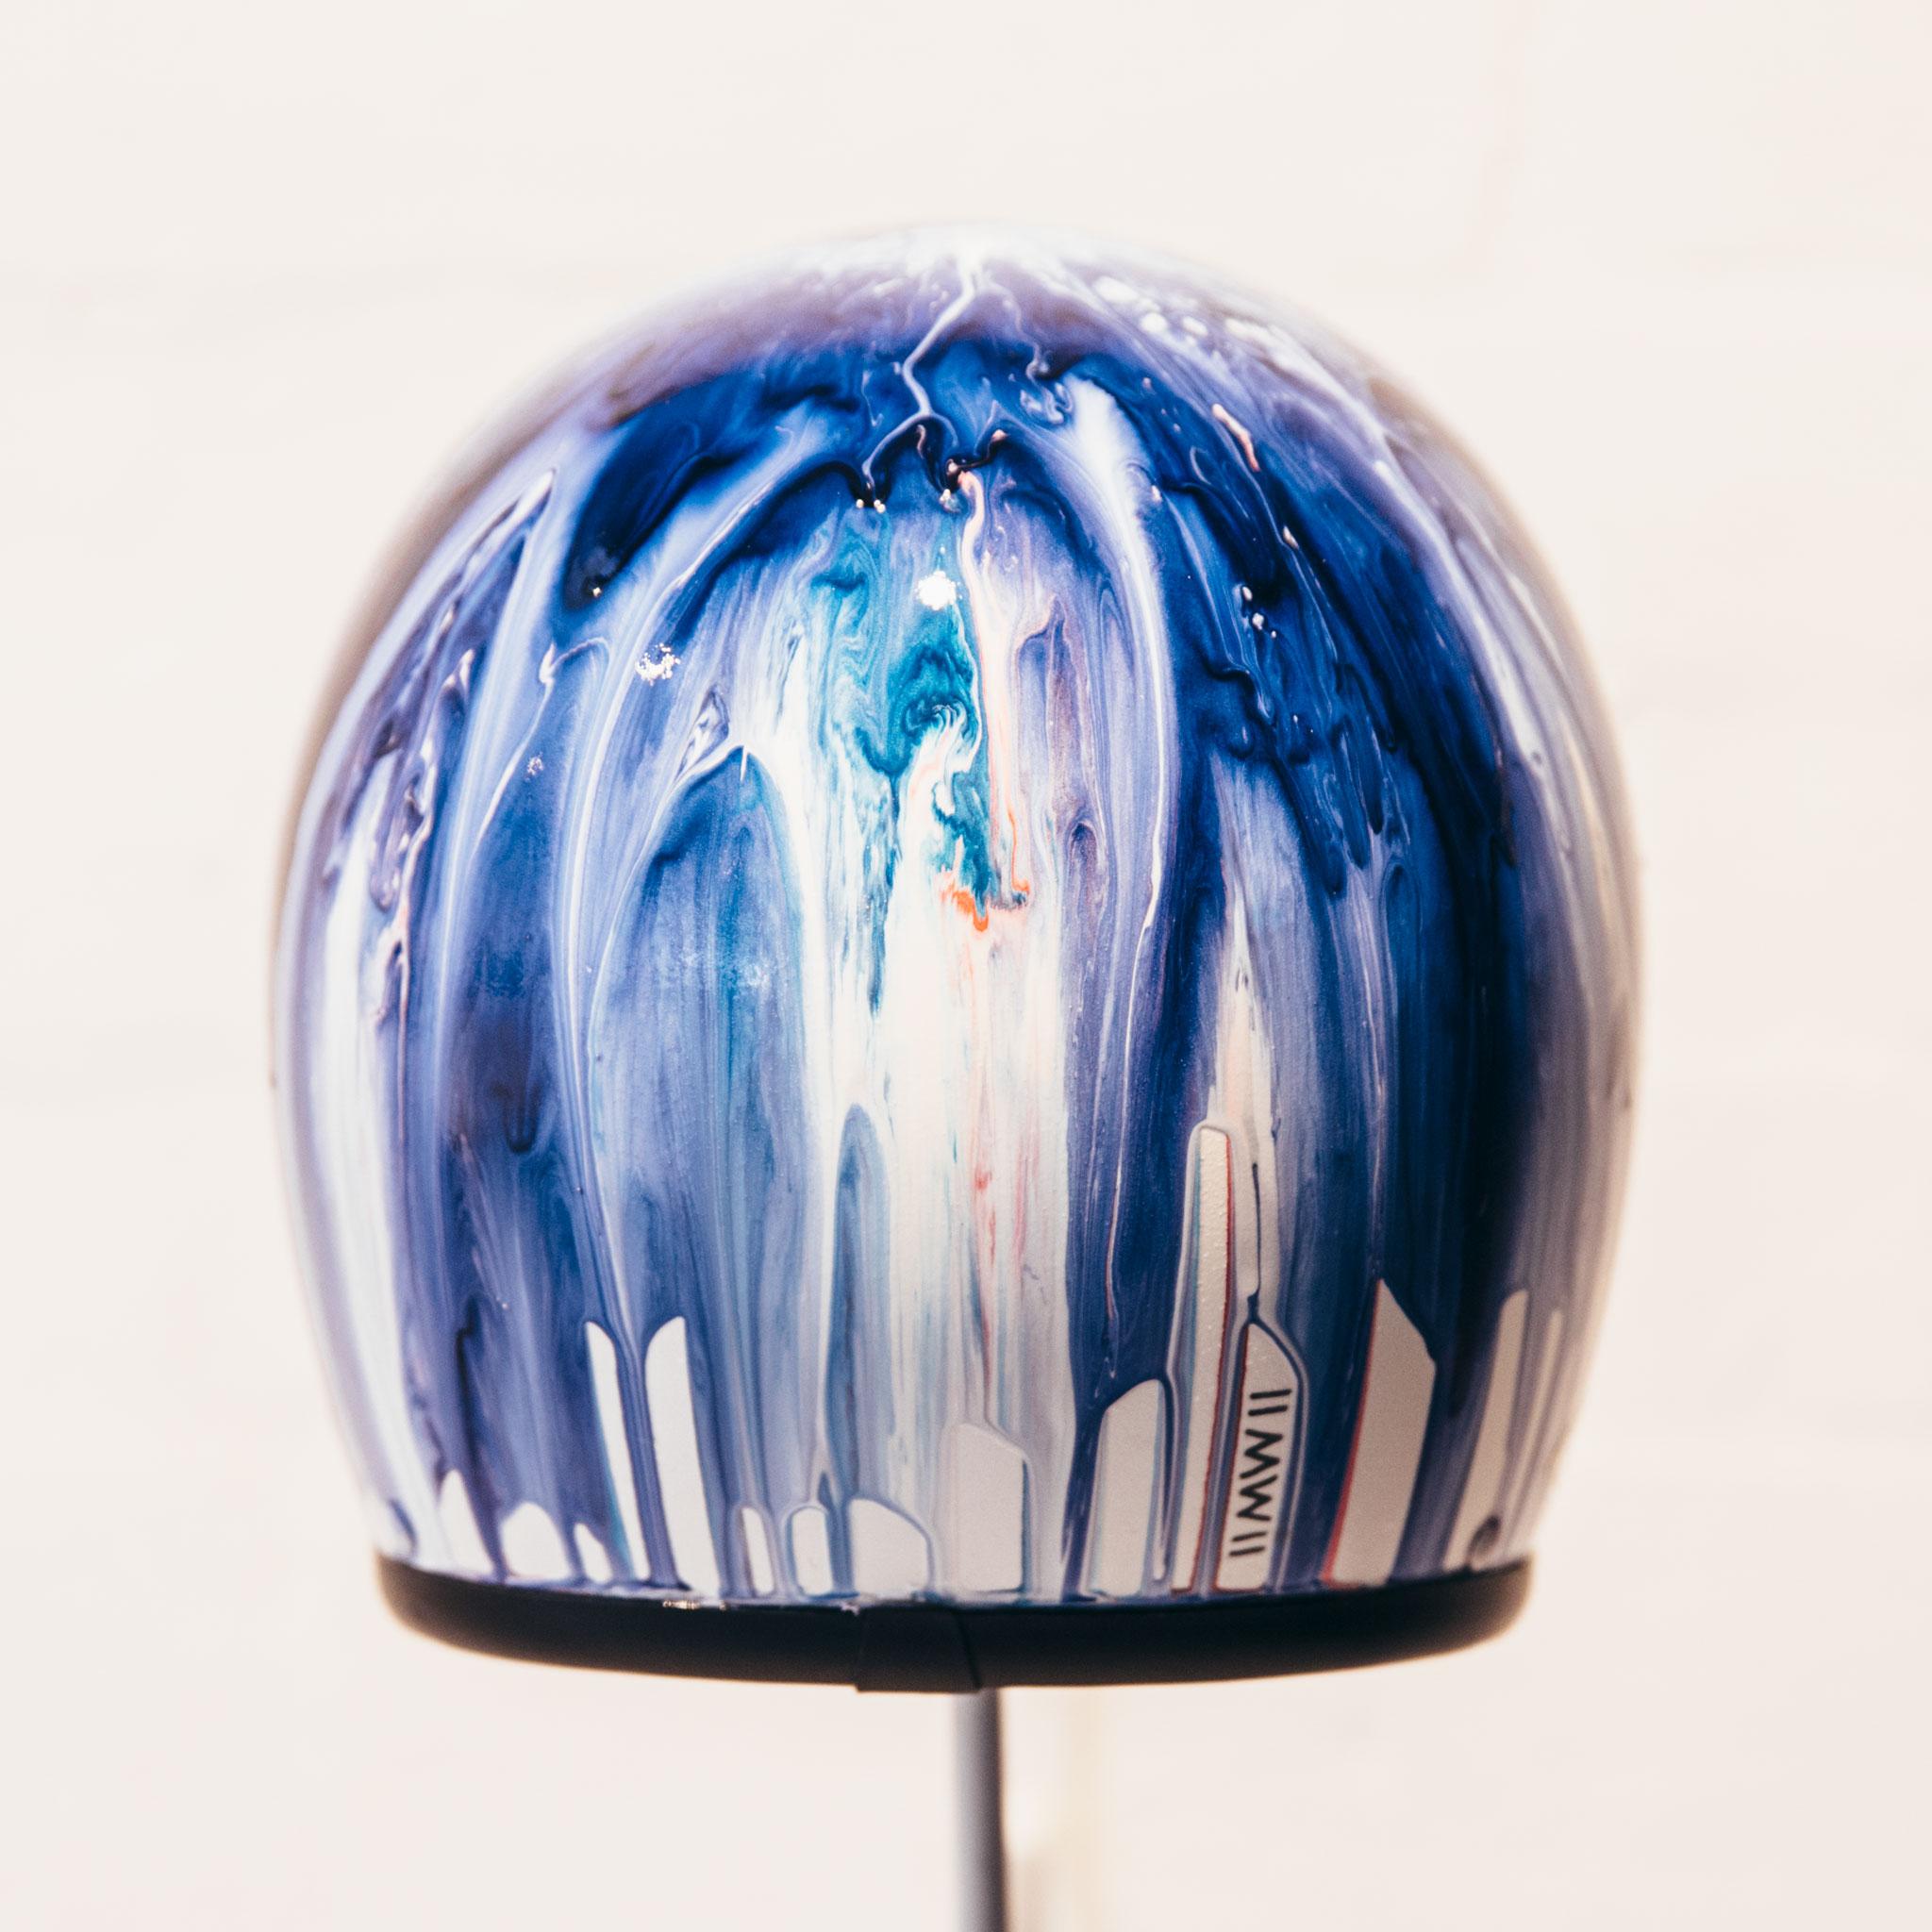 Art Pharamacy_Vandal Gallery_Sabotage MotorcyclesTwenty20_exhibition_5393.jpg